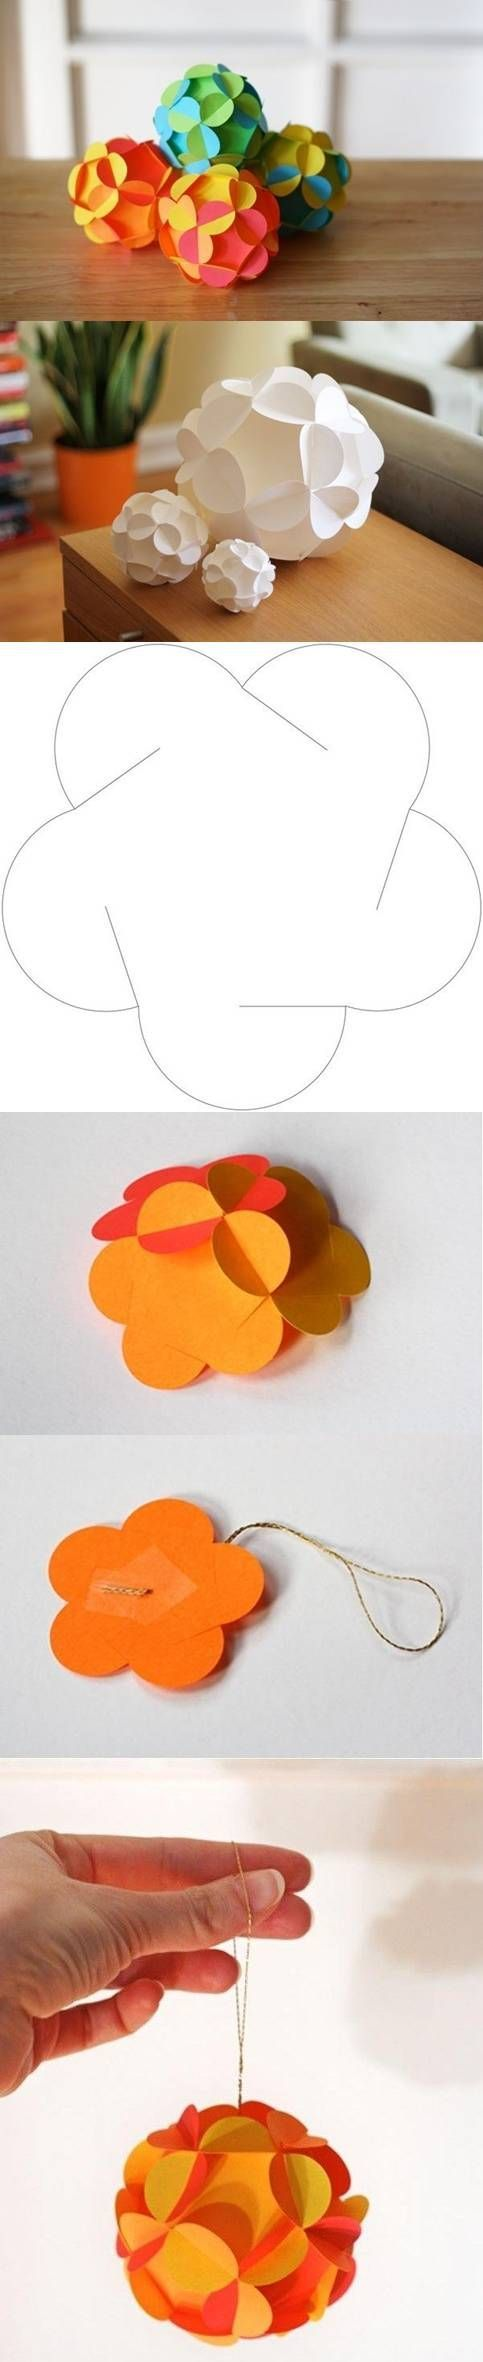 DIY Paper Christmas Balls DIY Projects / UsefulDIY.com